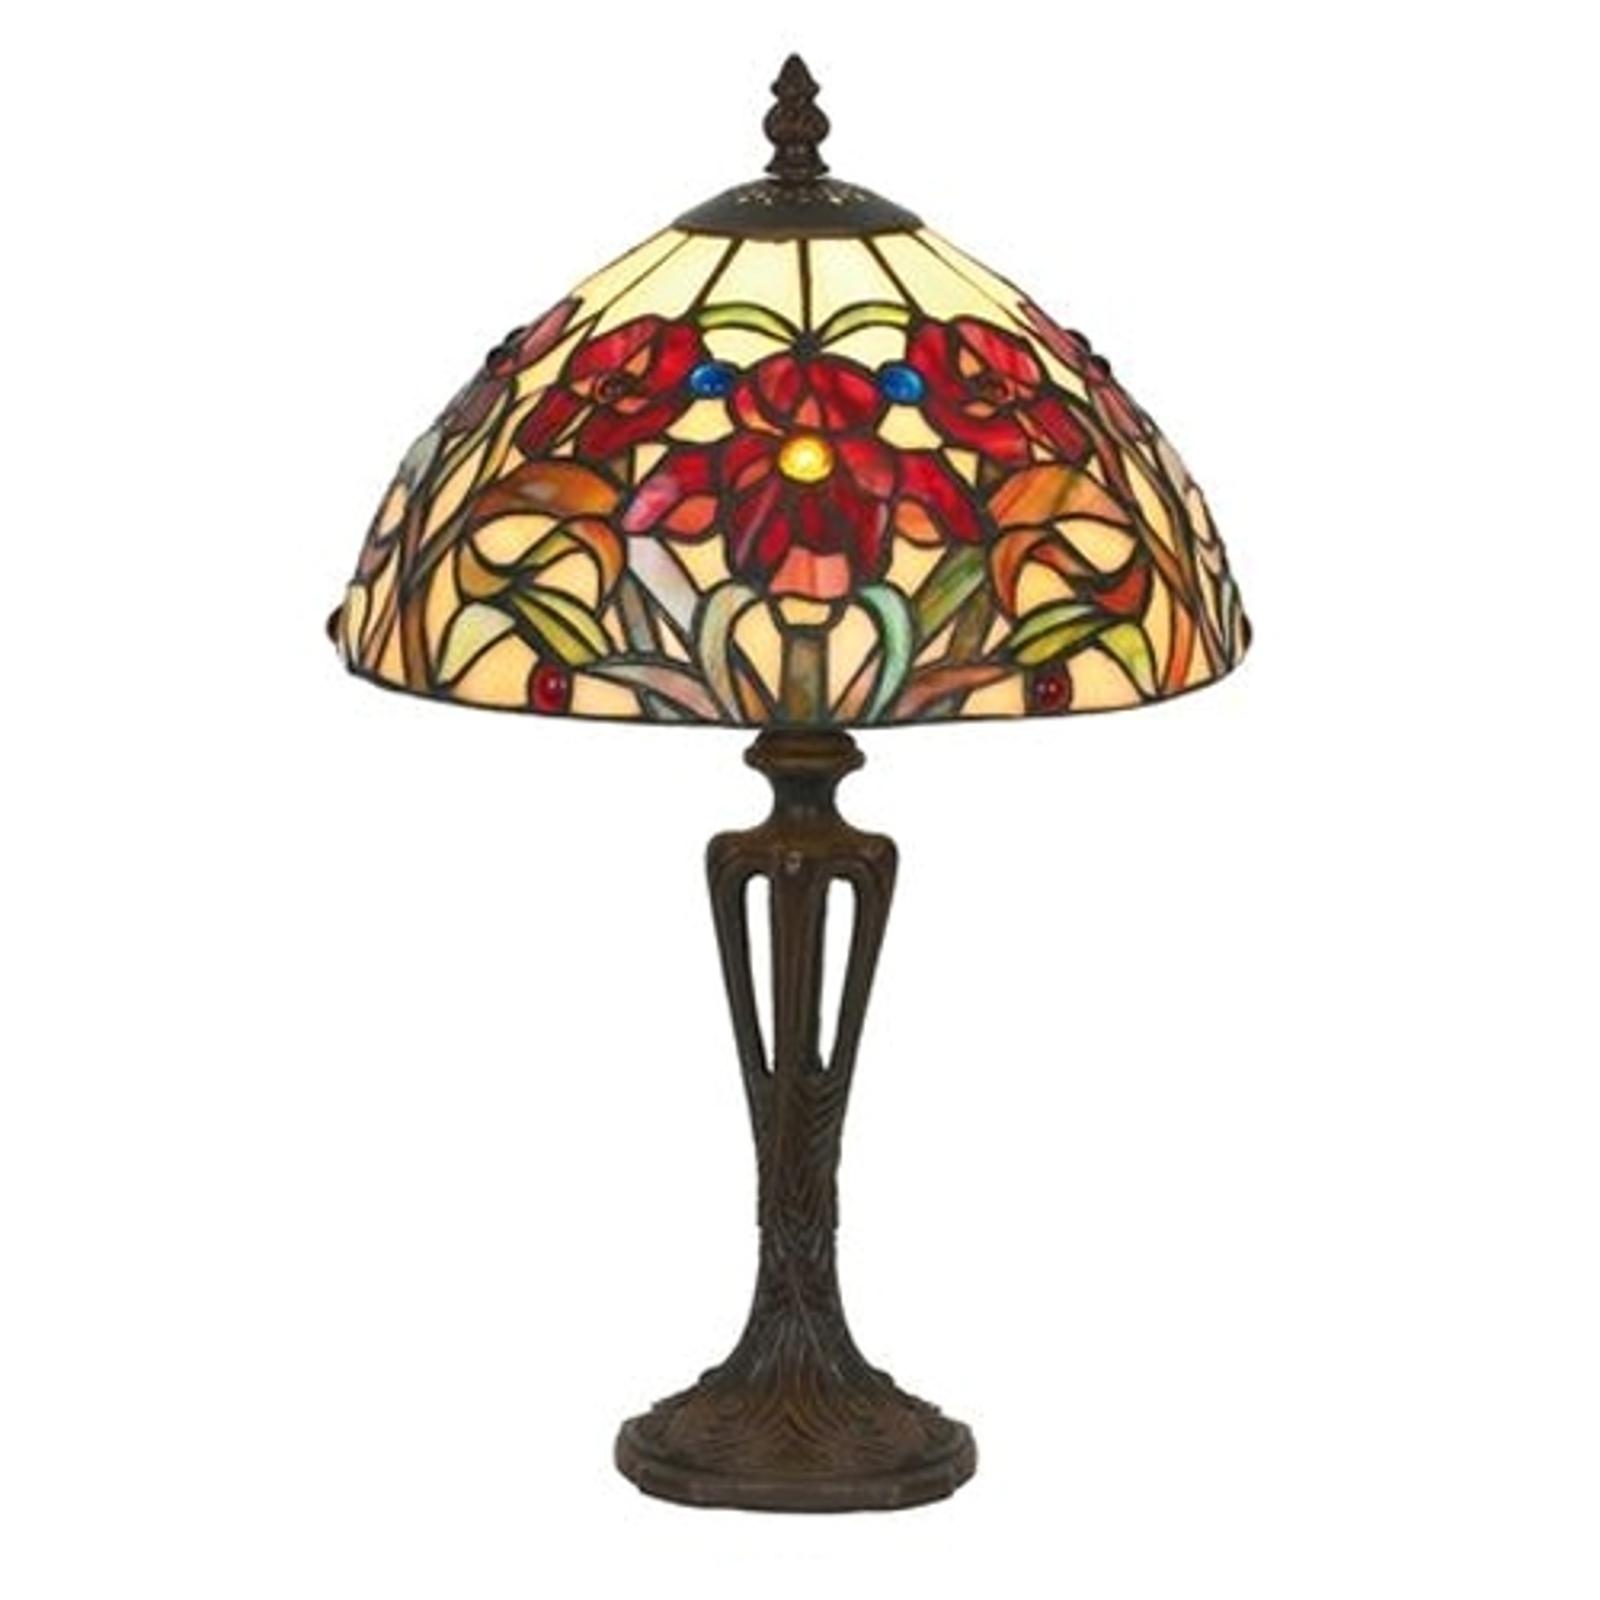 ELINE - klassisk bordlampe i Tiffany stil, 40 cm